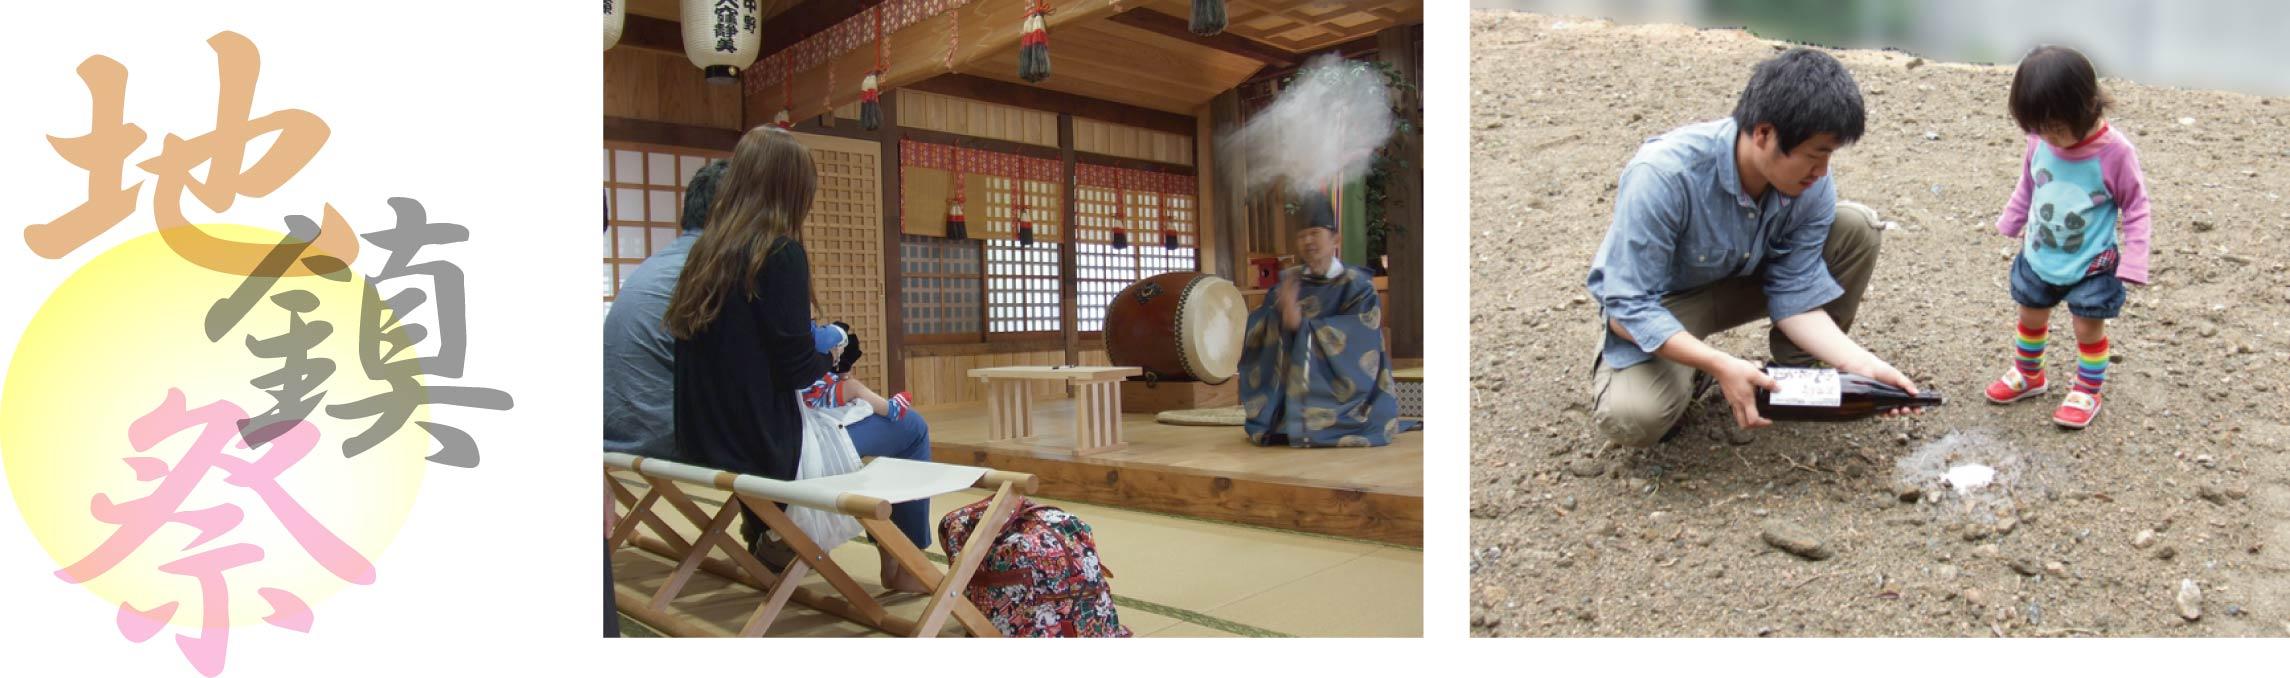 KuraSi-natu-sin72-08.jpg